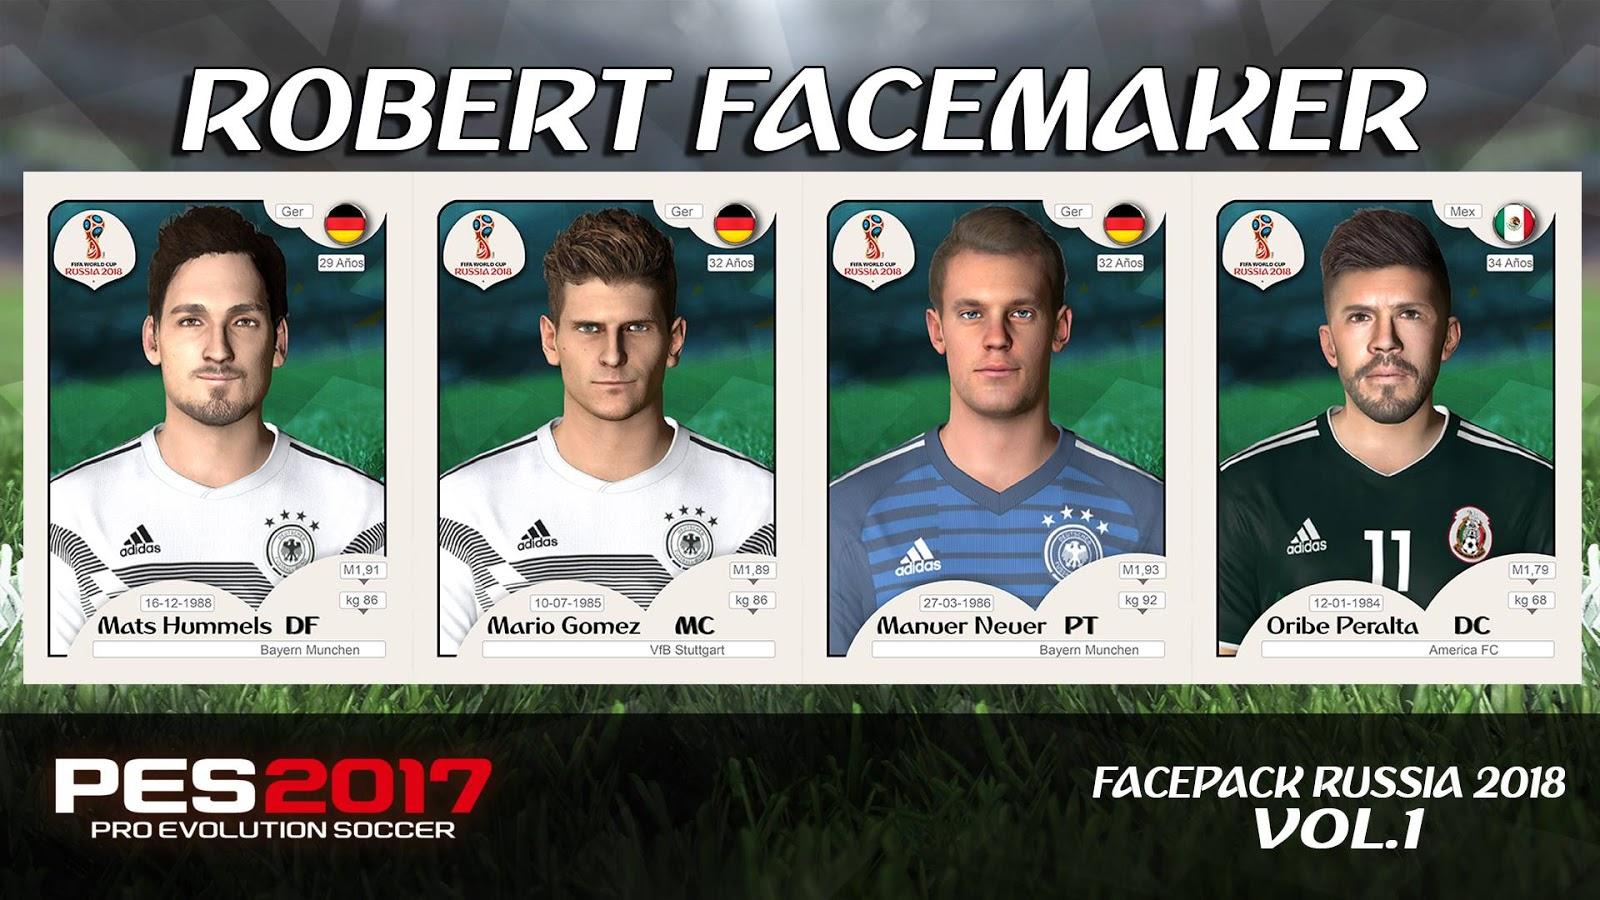 PES 2017 Facepack Russia 2018 Vol.1 by Robert Facemaker